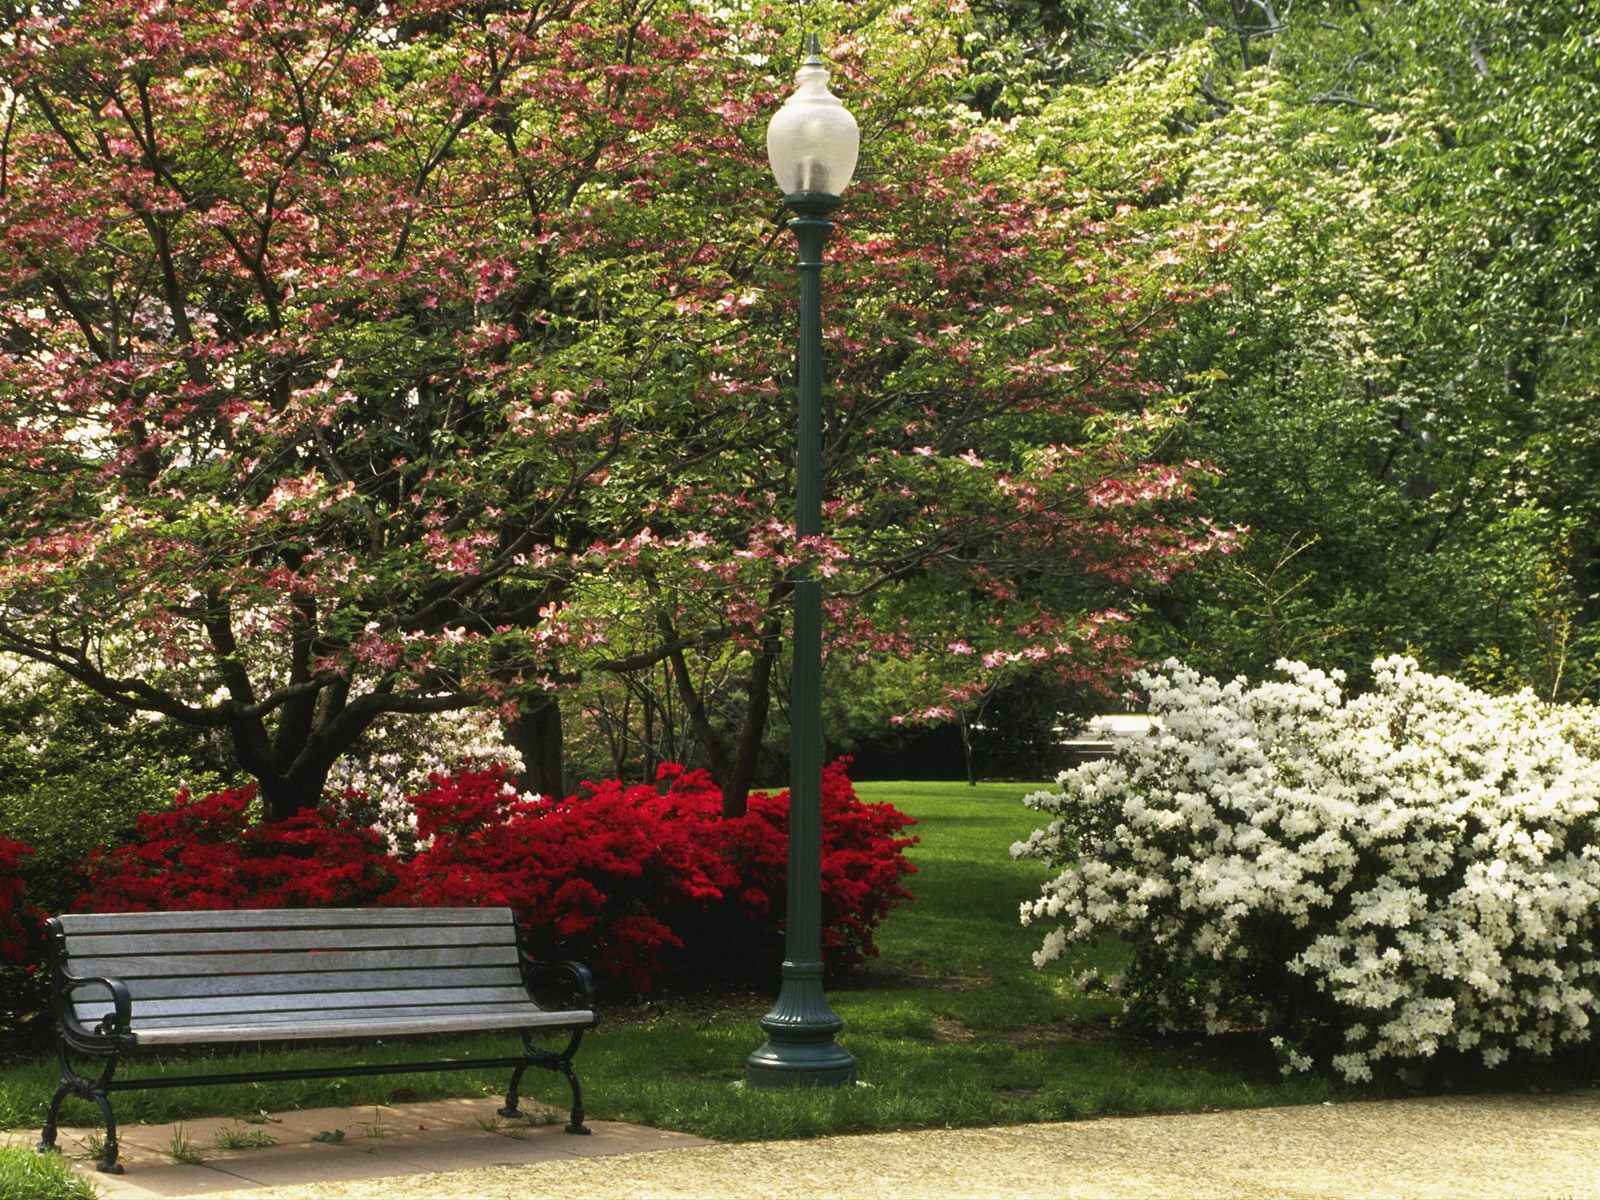 Central Park in Spring Season   Wallpaper 31396 1600x1200